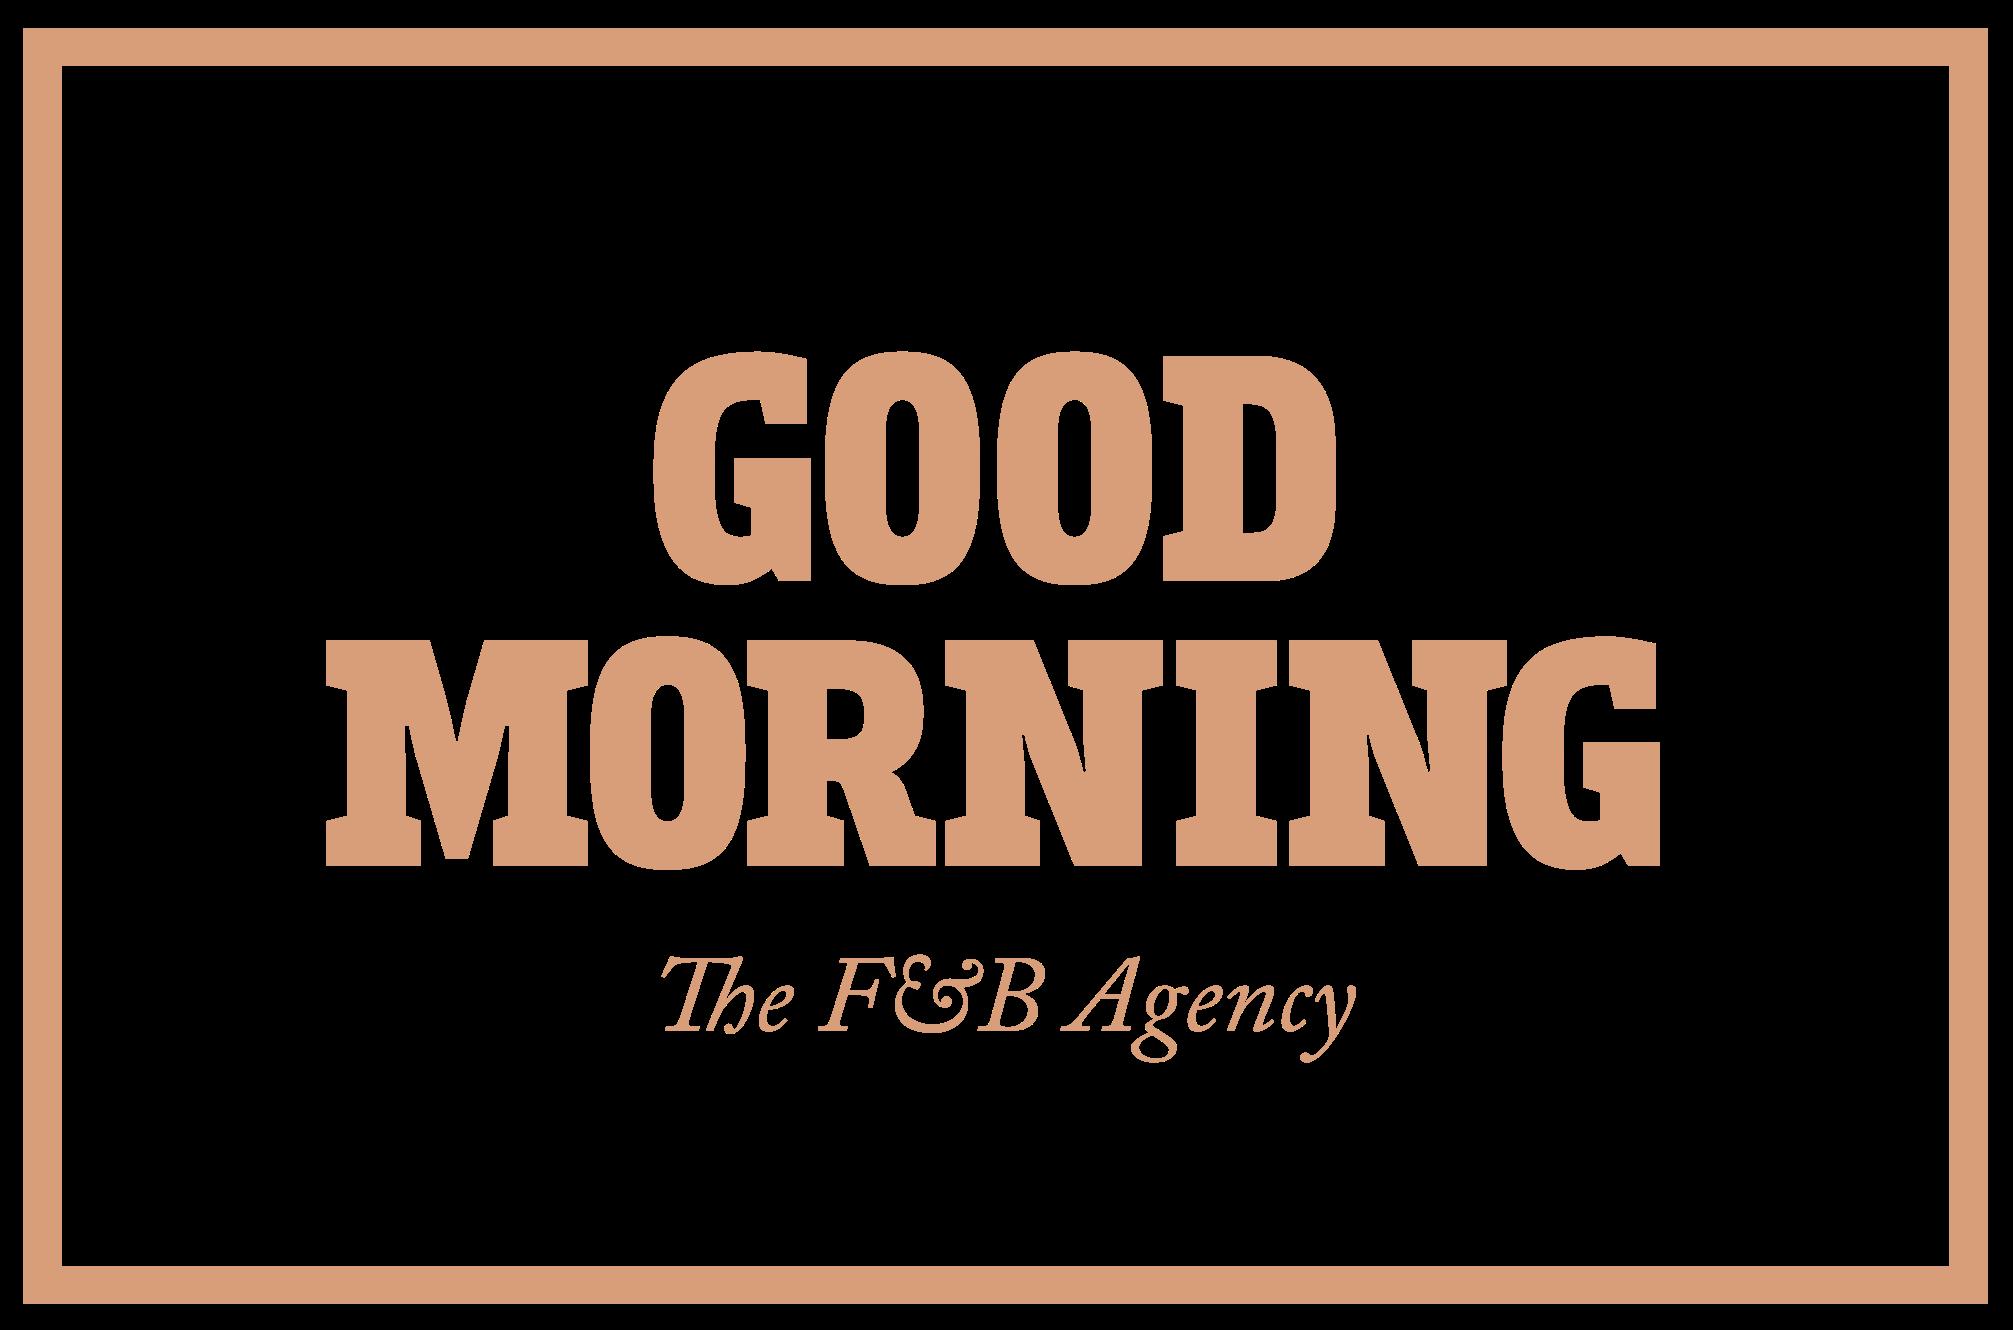 Good Morning Agency iKentoo.png